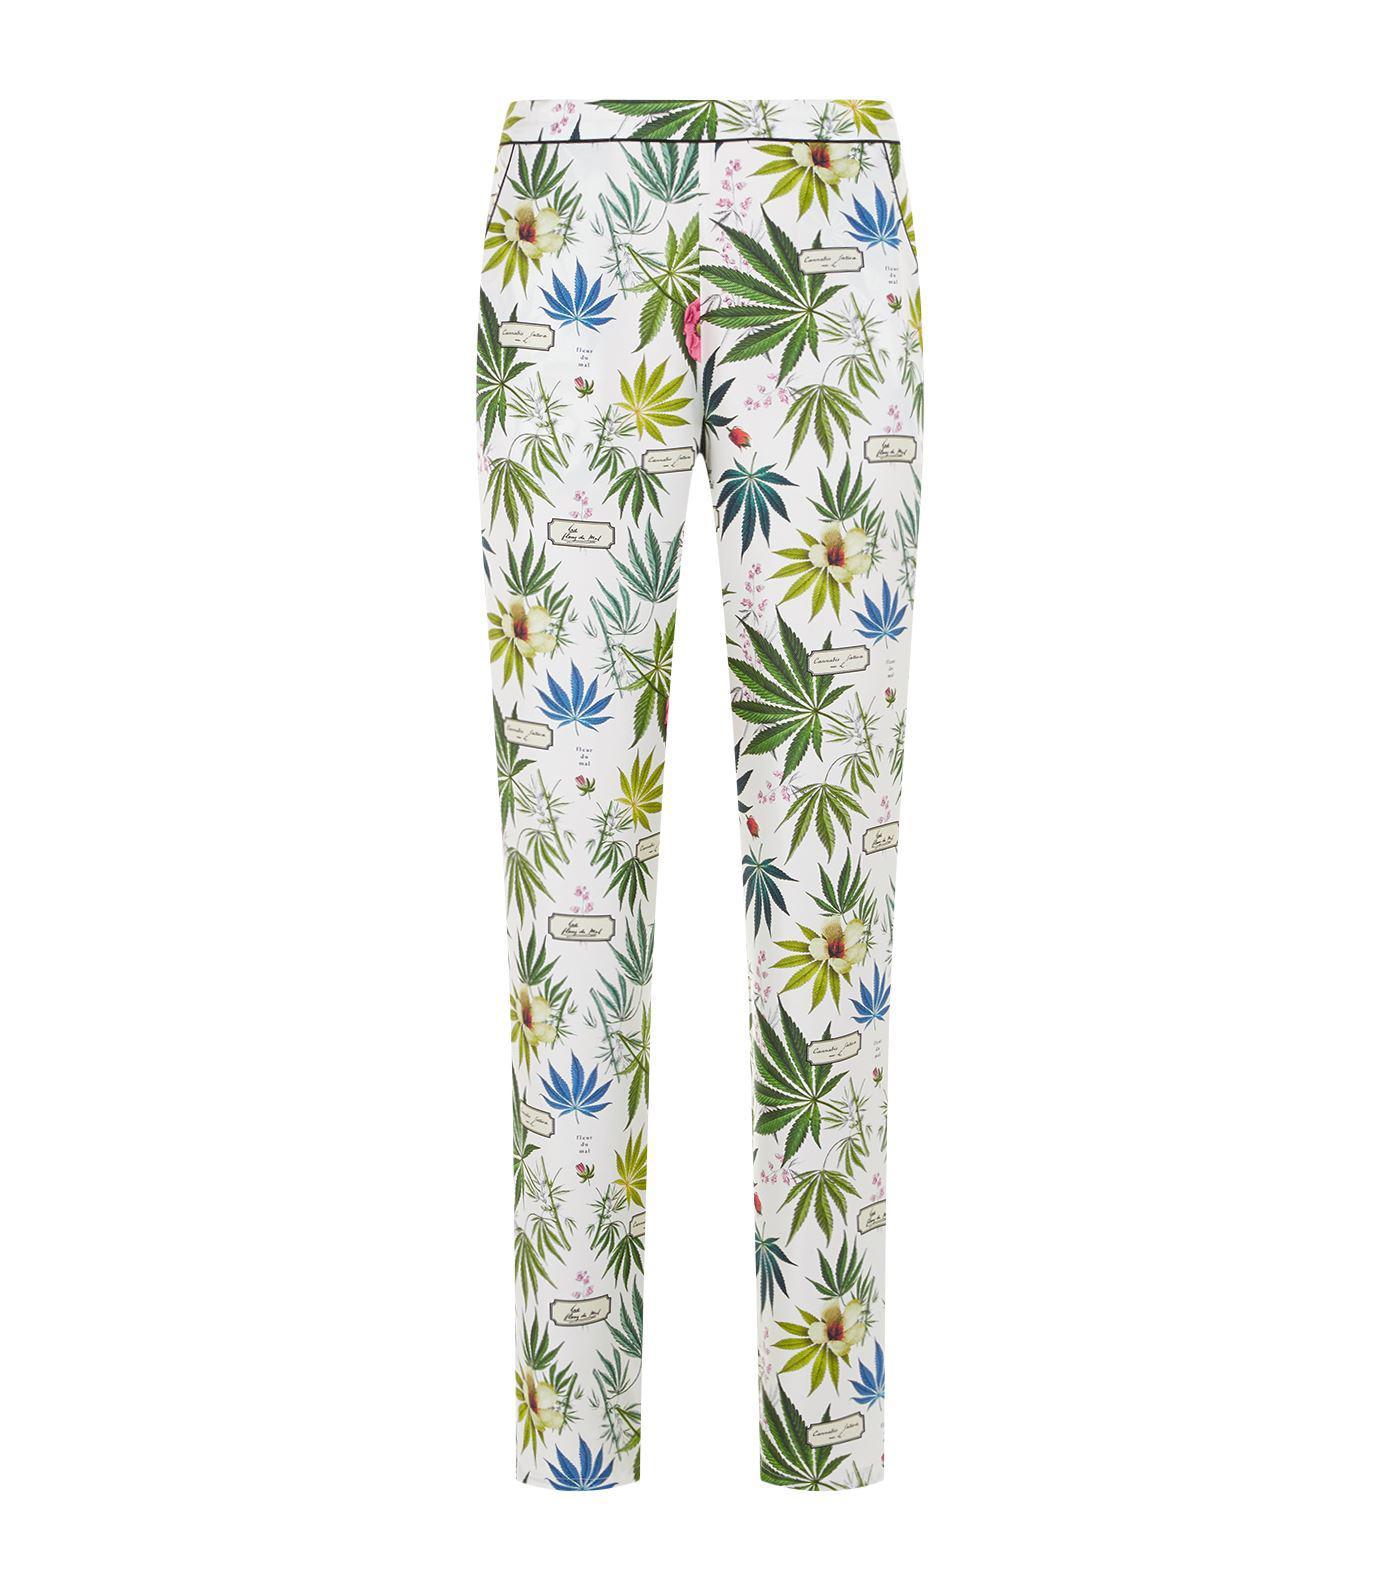 ece5b00e14 Fleur du Mal Botanical Printed Pyjama Trousers - Lyst